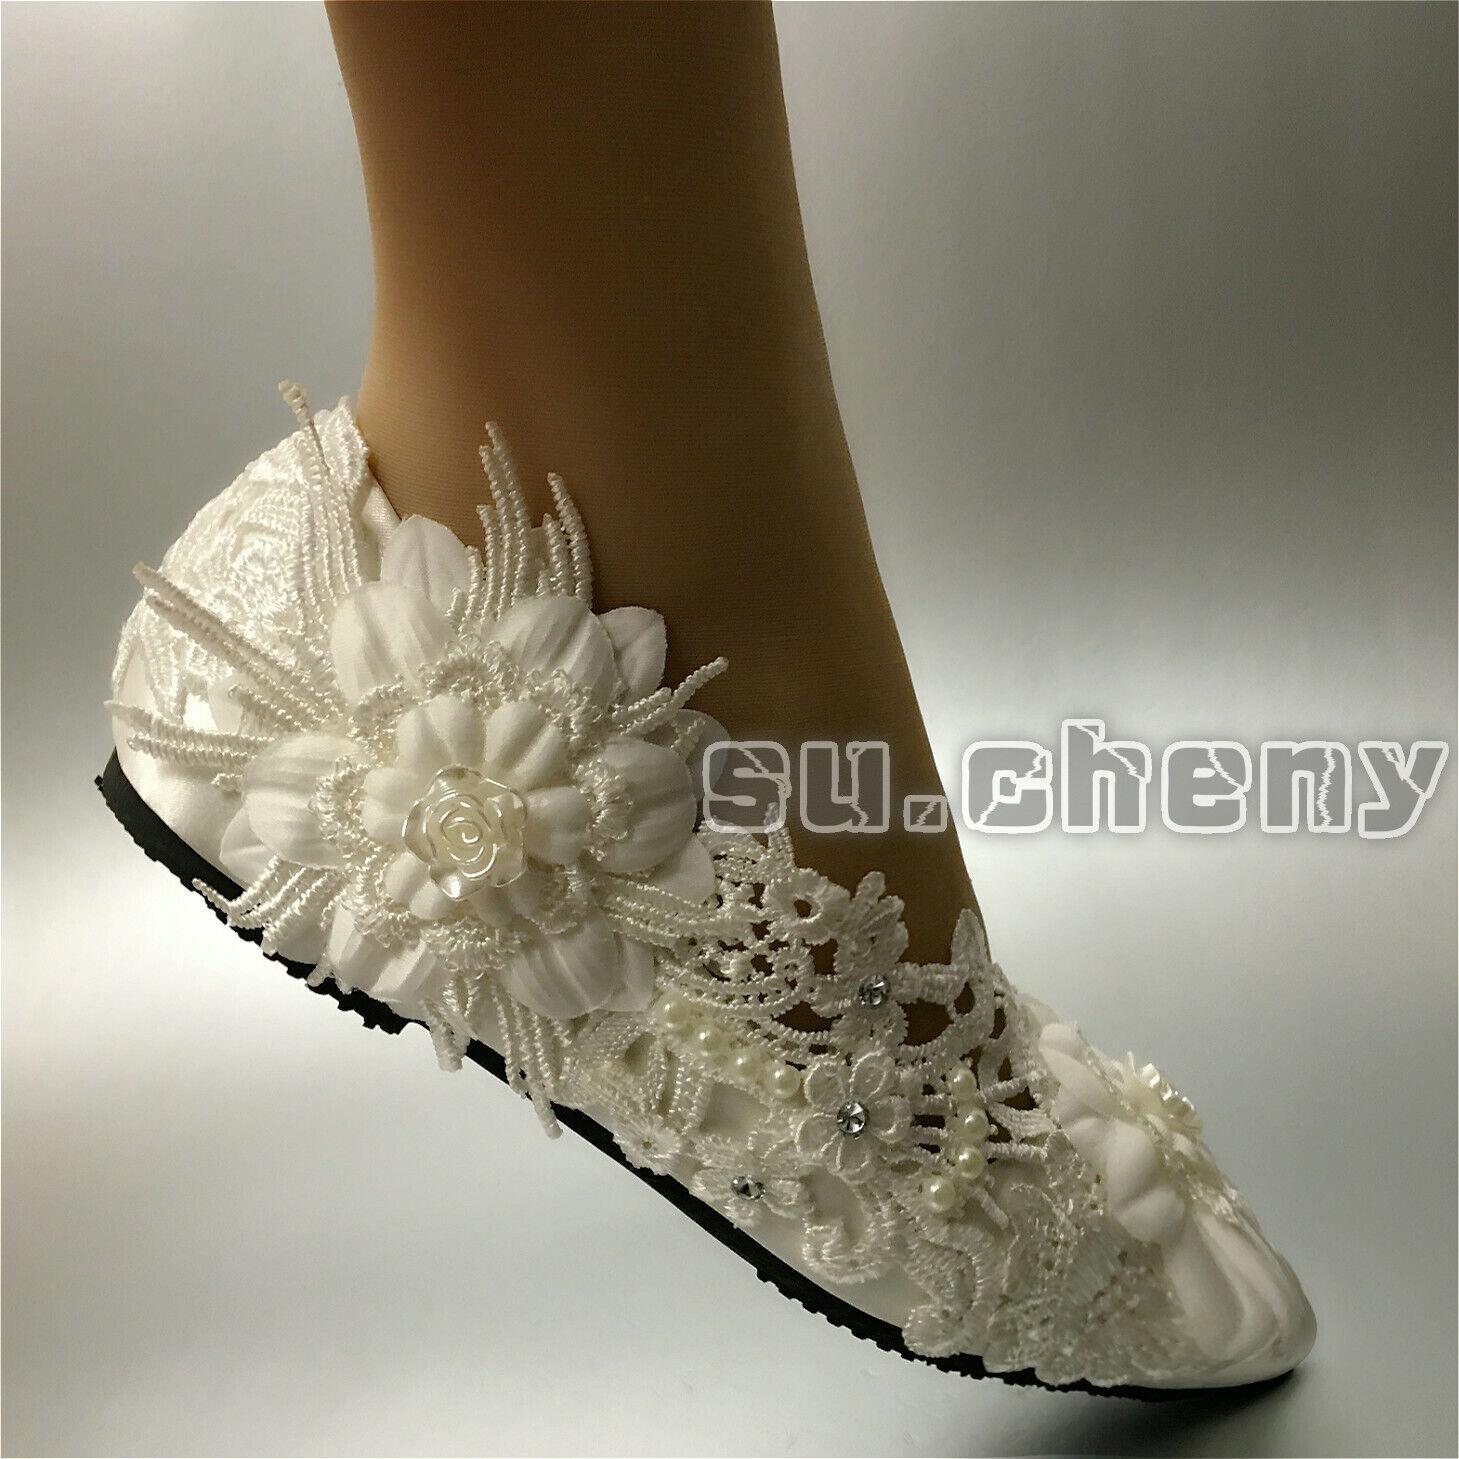 On. cheny Ivory White Silk Bridal Satin Flat Ballet Lace Shoes 5